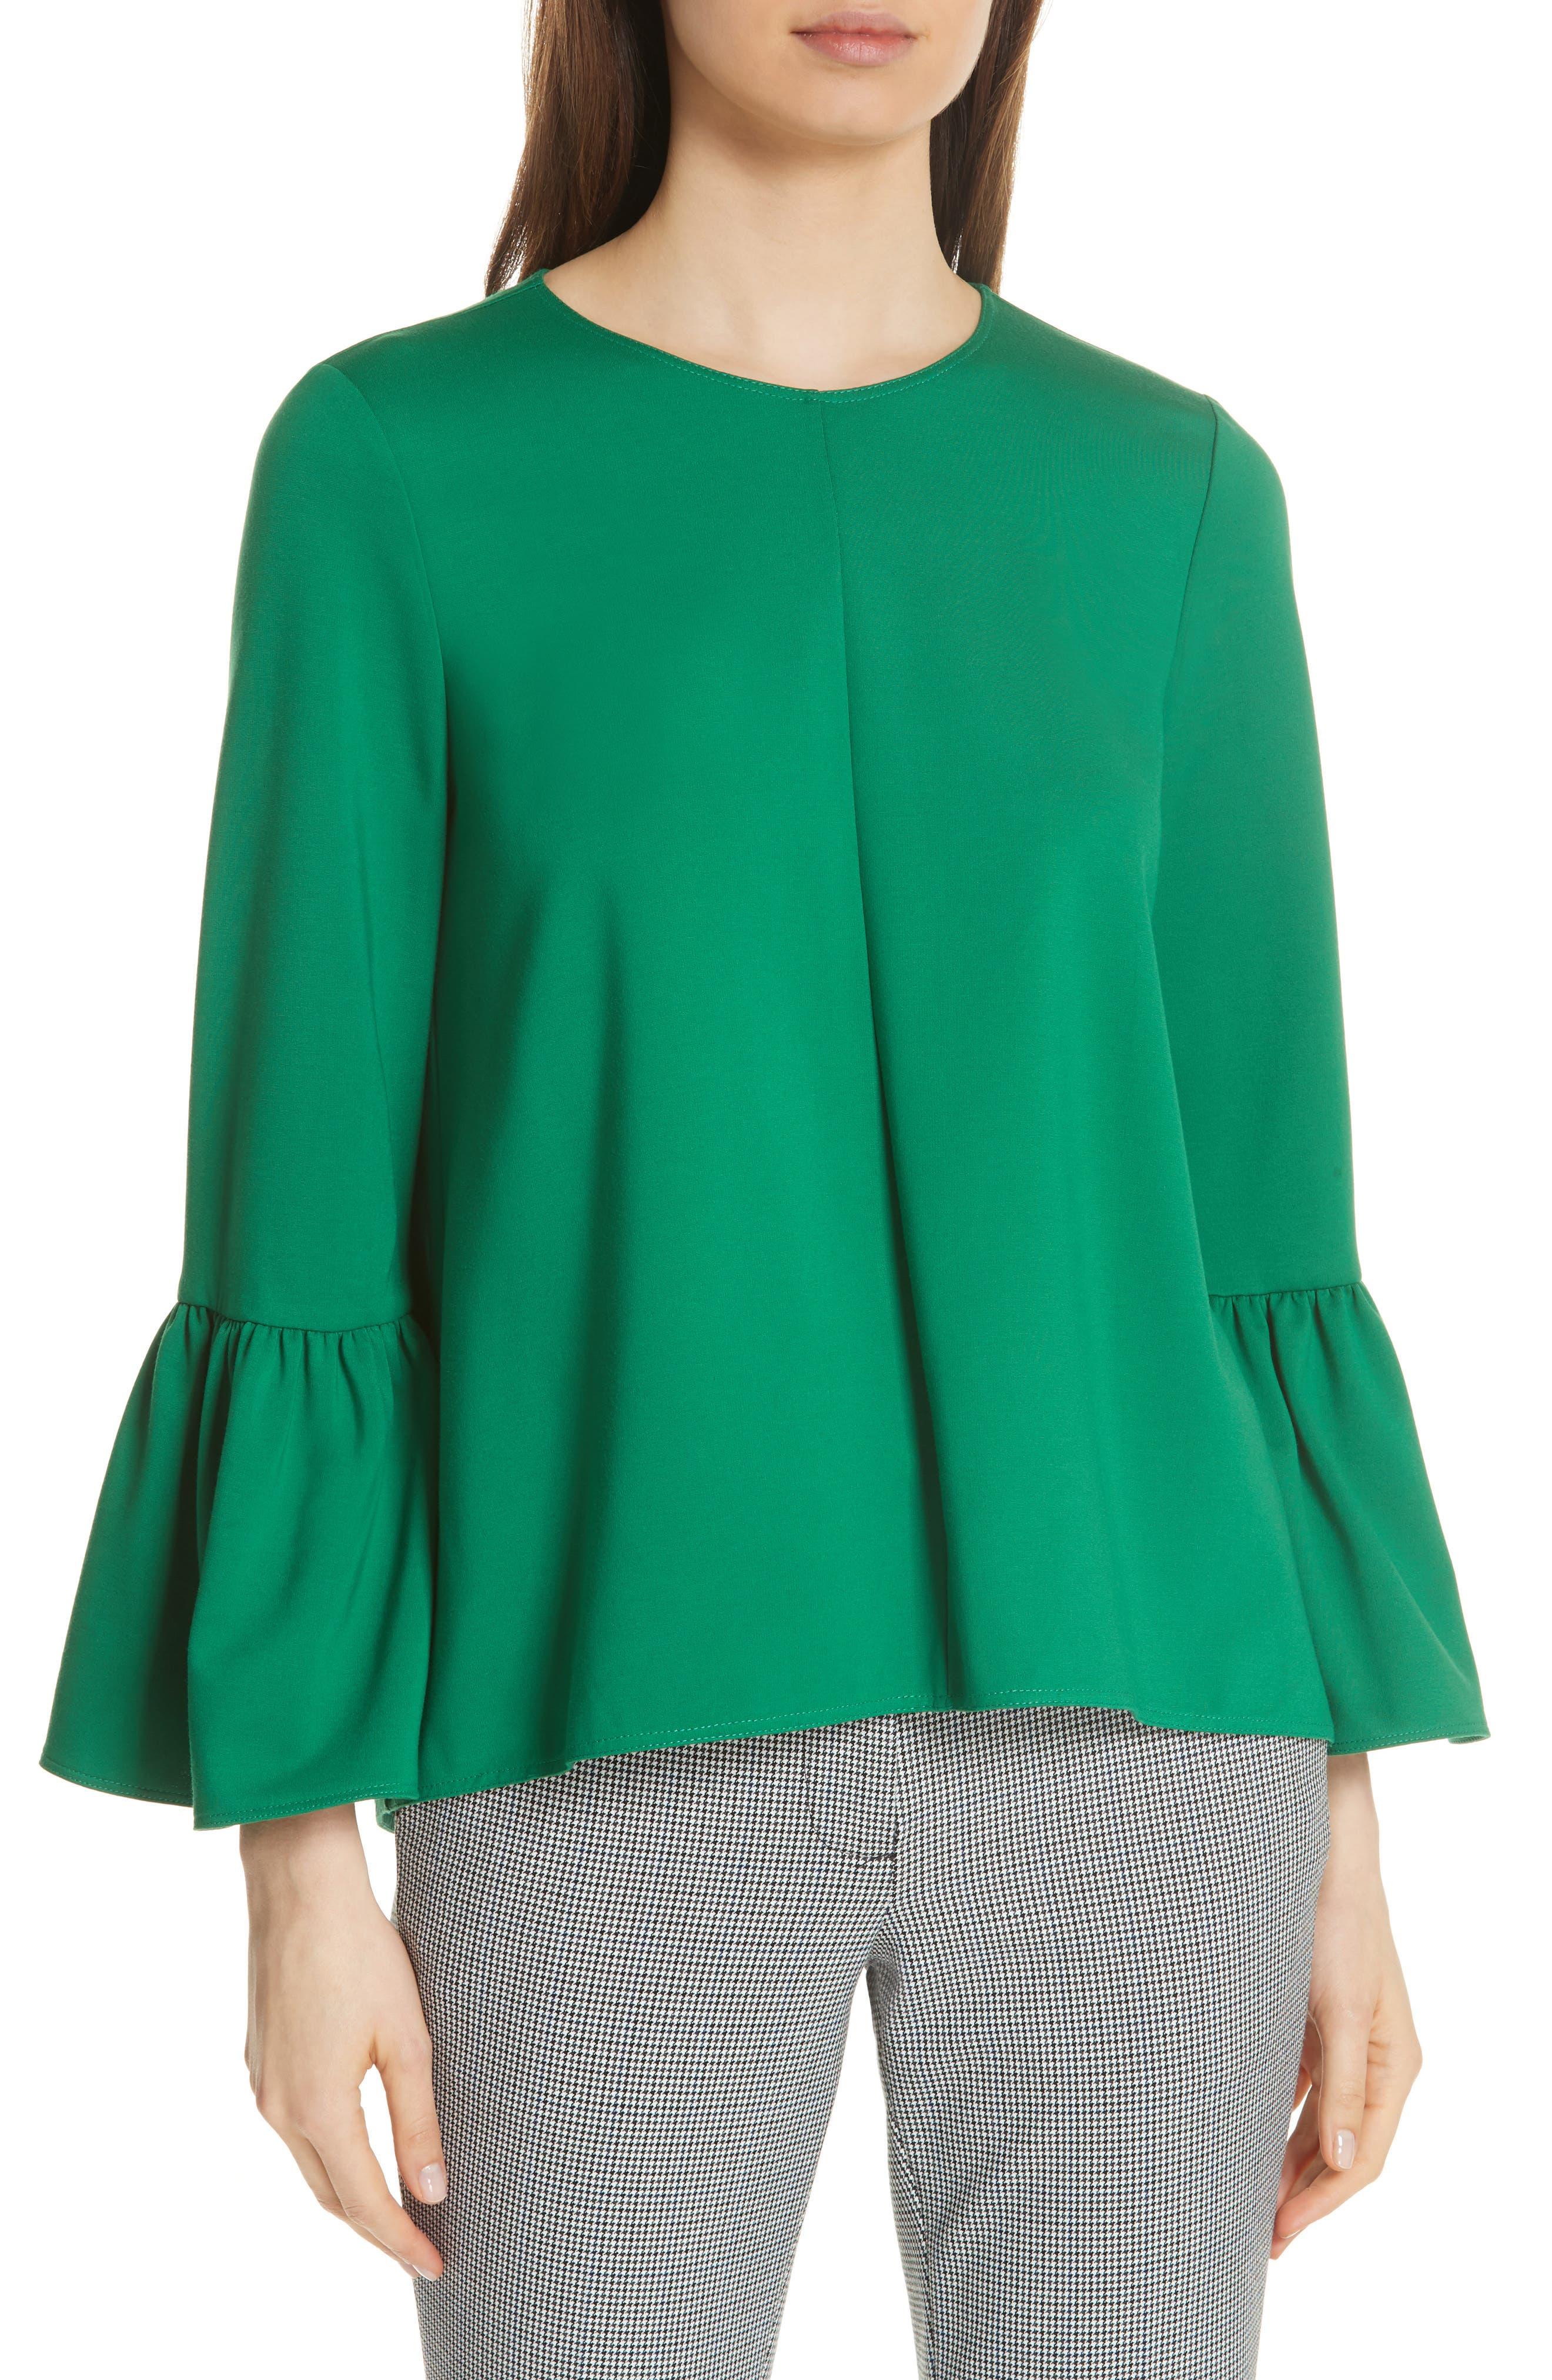 Weston Crewneck Bell-Sleeve Top in Green